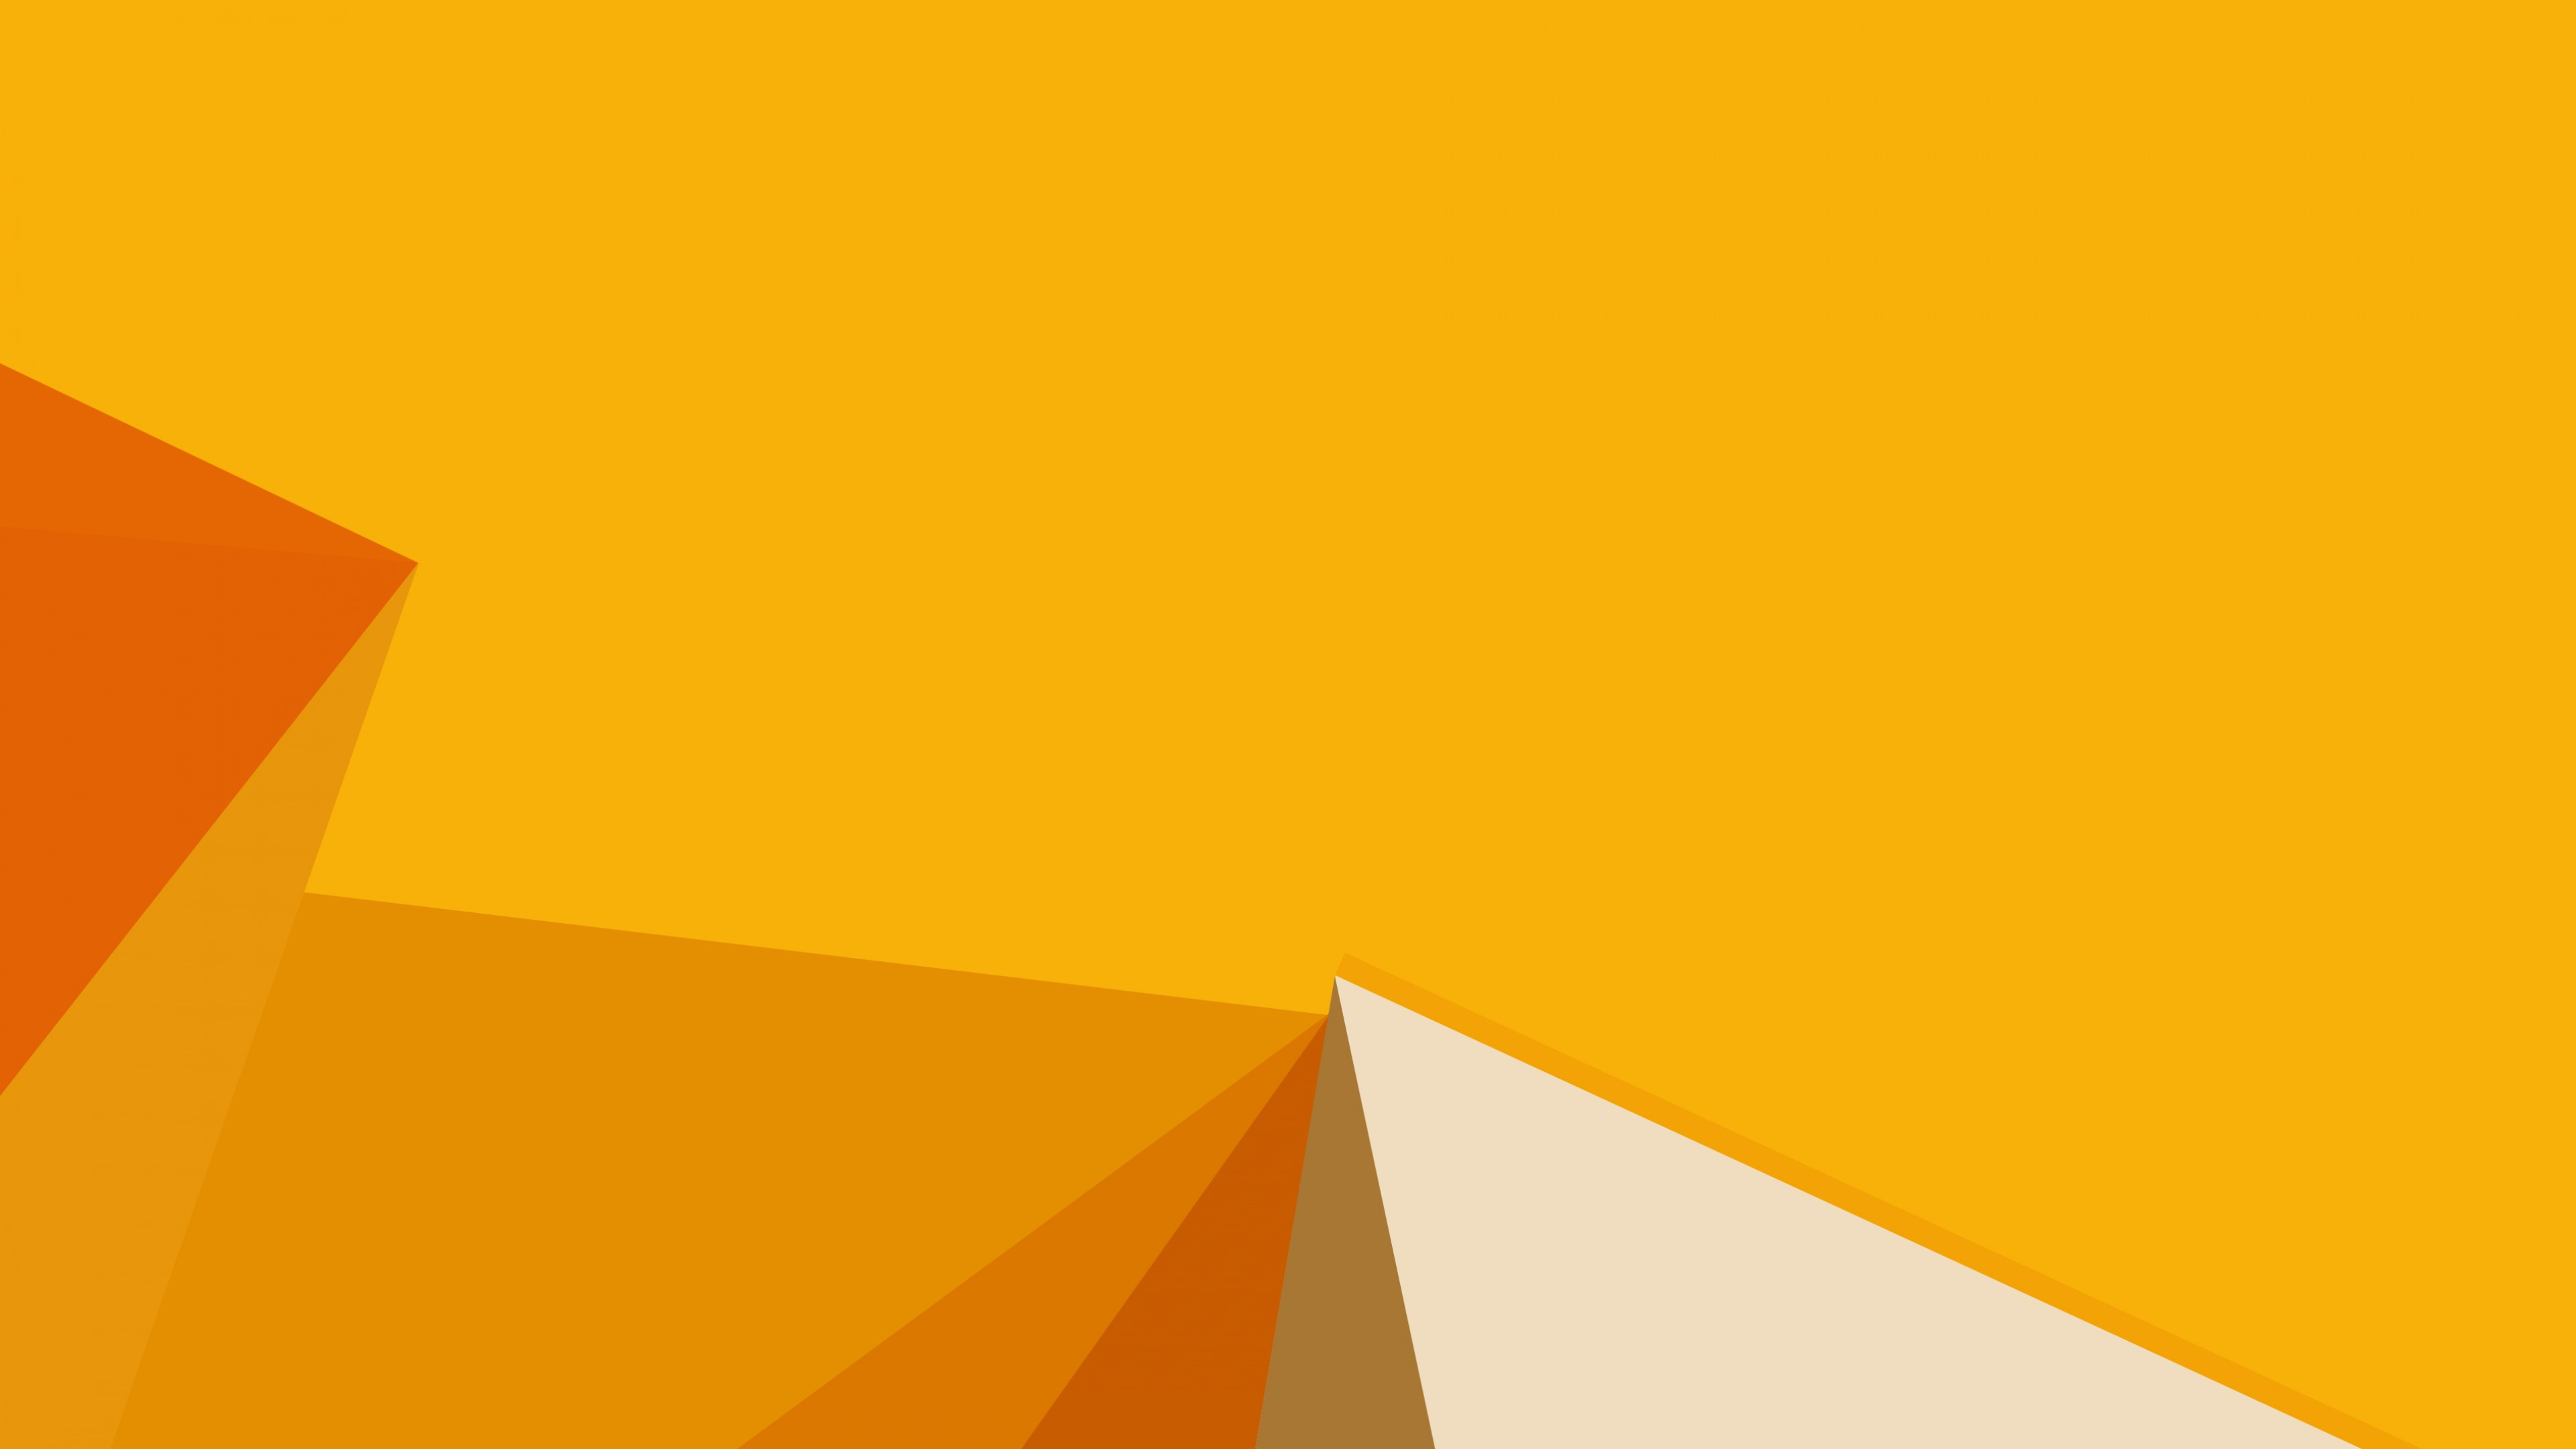 Low Poly Iphone Wallpaper Wallpaper Polygon Yellow 4k Os 15376